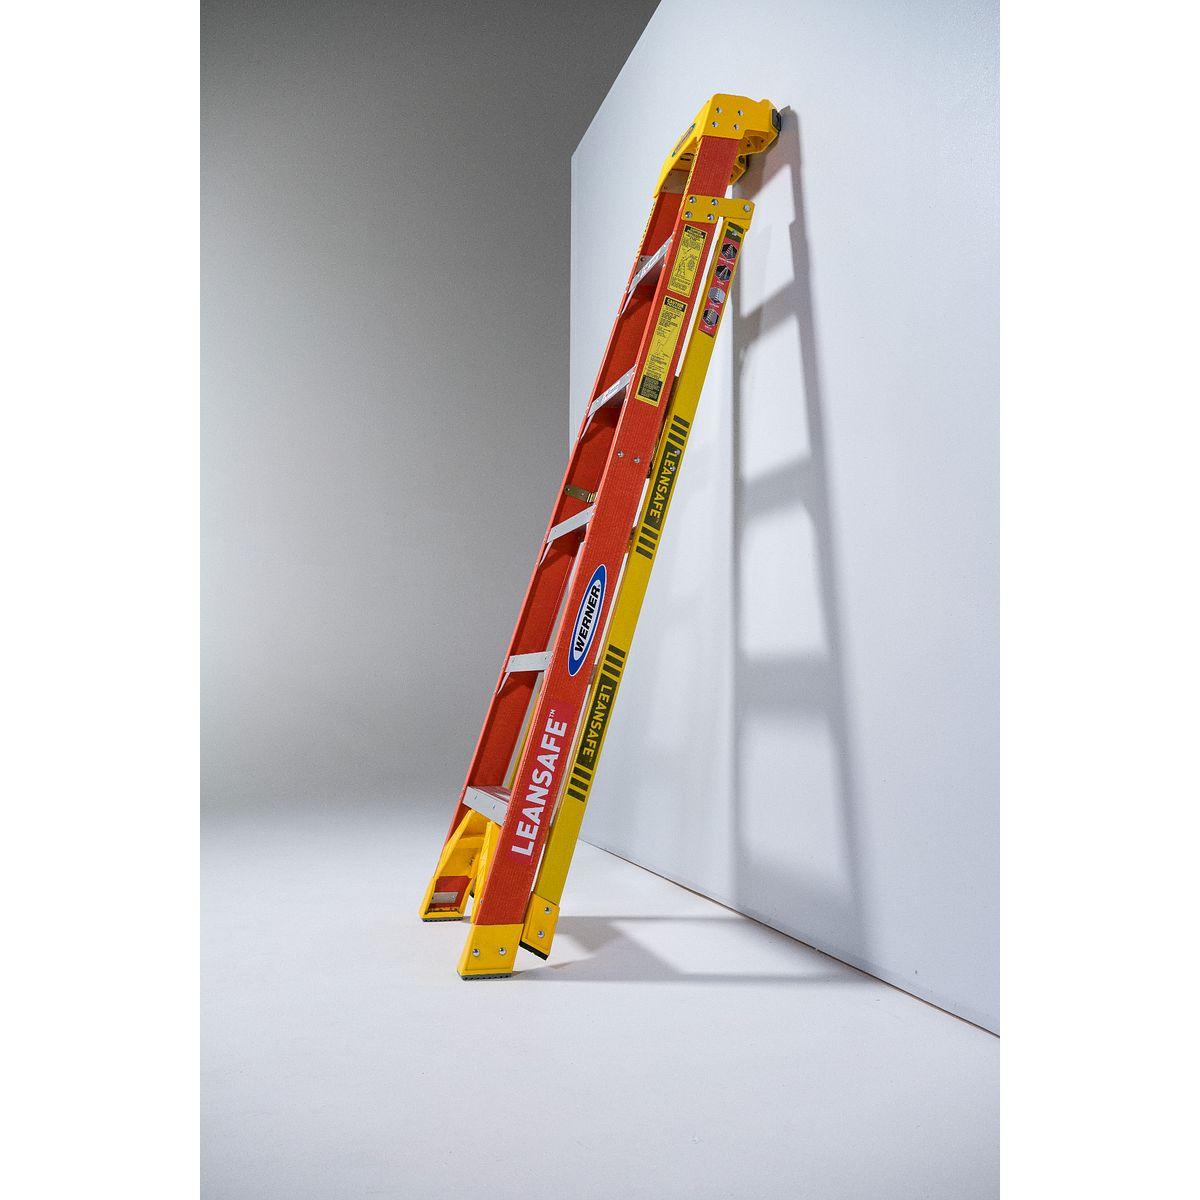 123 a frame ladder safety tips step ladders ladders the for A frame ladder safety tips